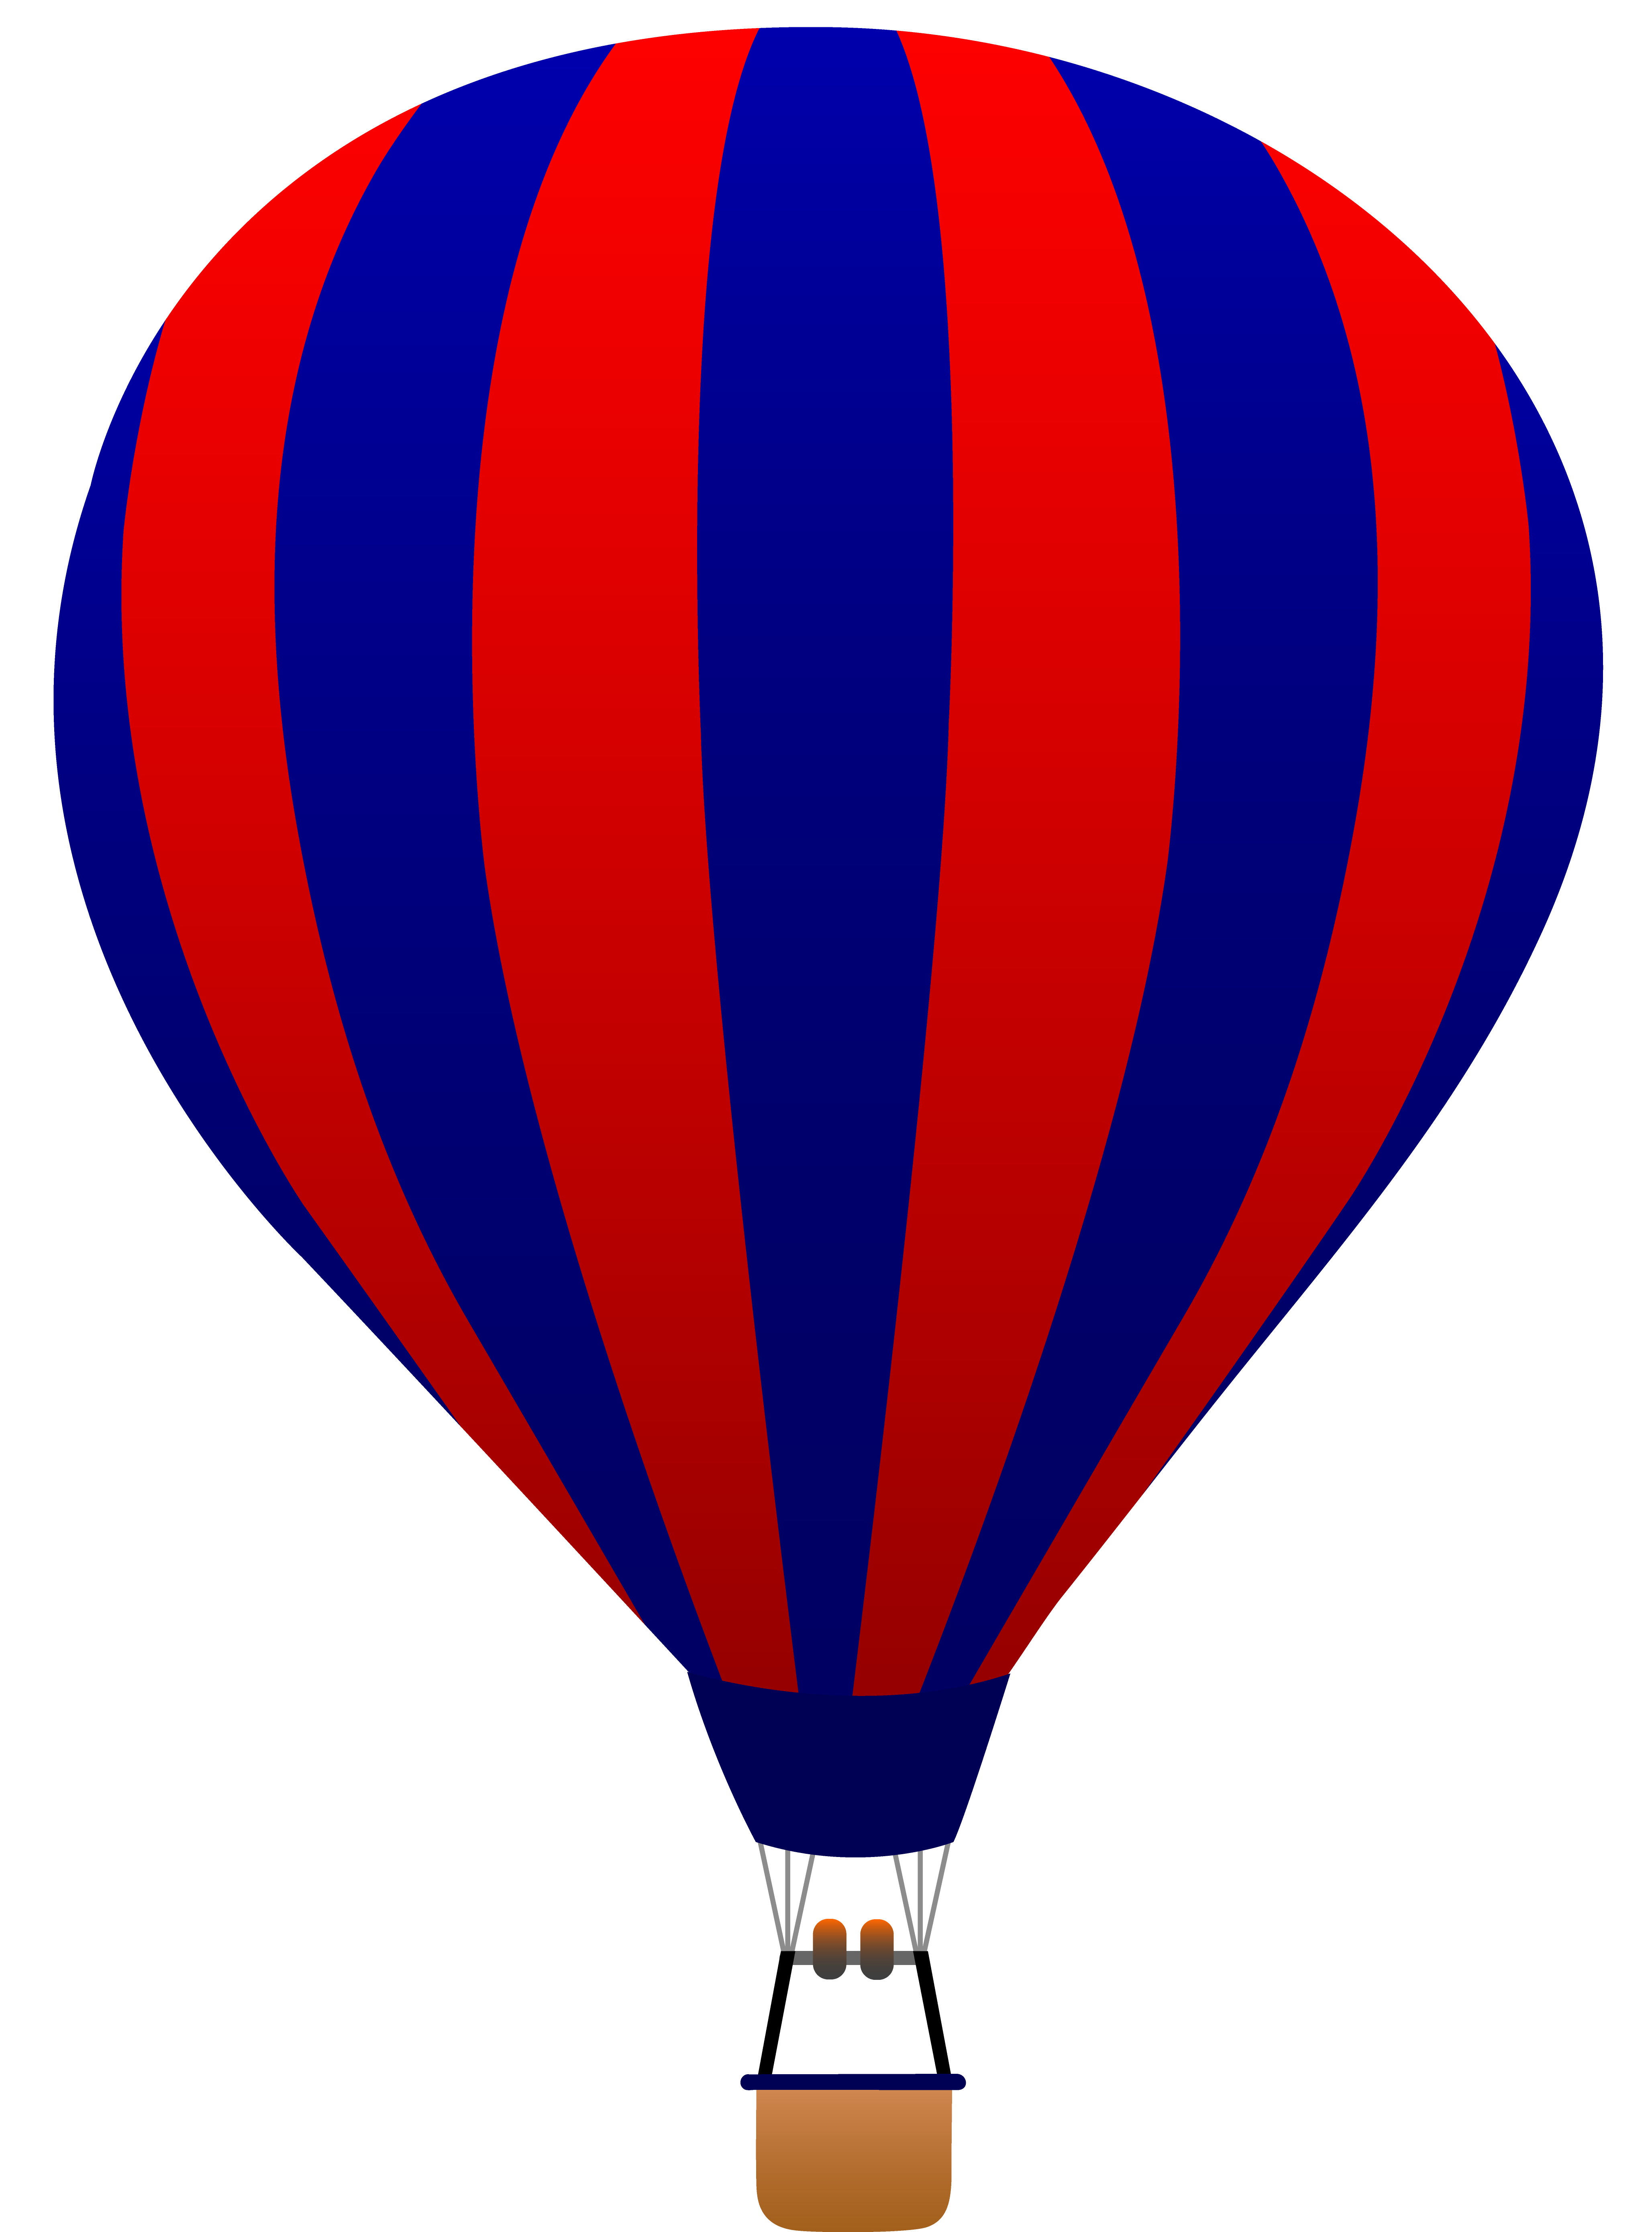 Hot Air Balloon clipart #3, Download drawings